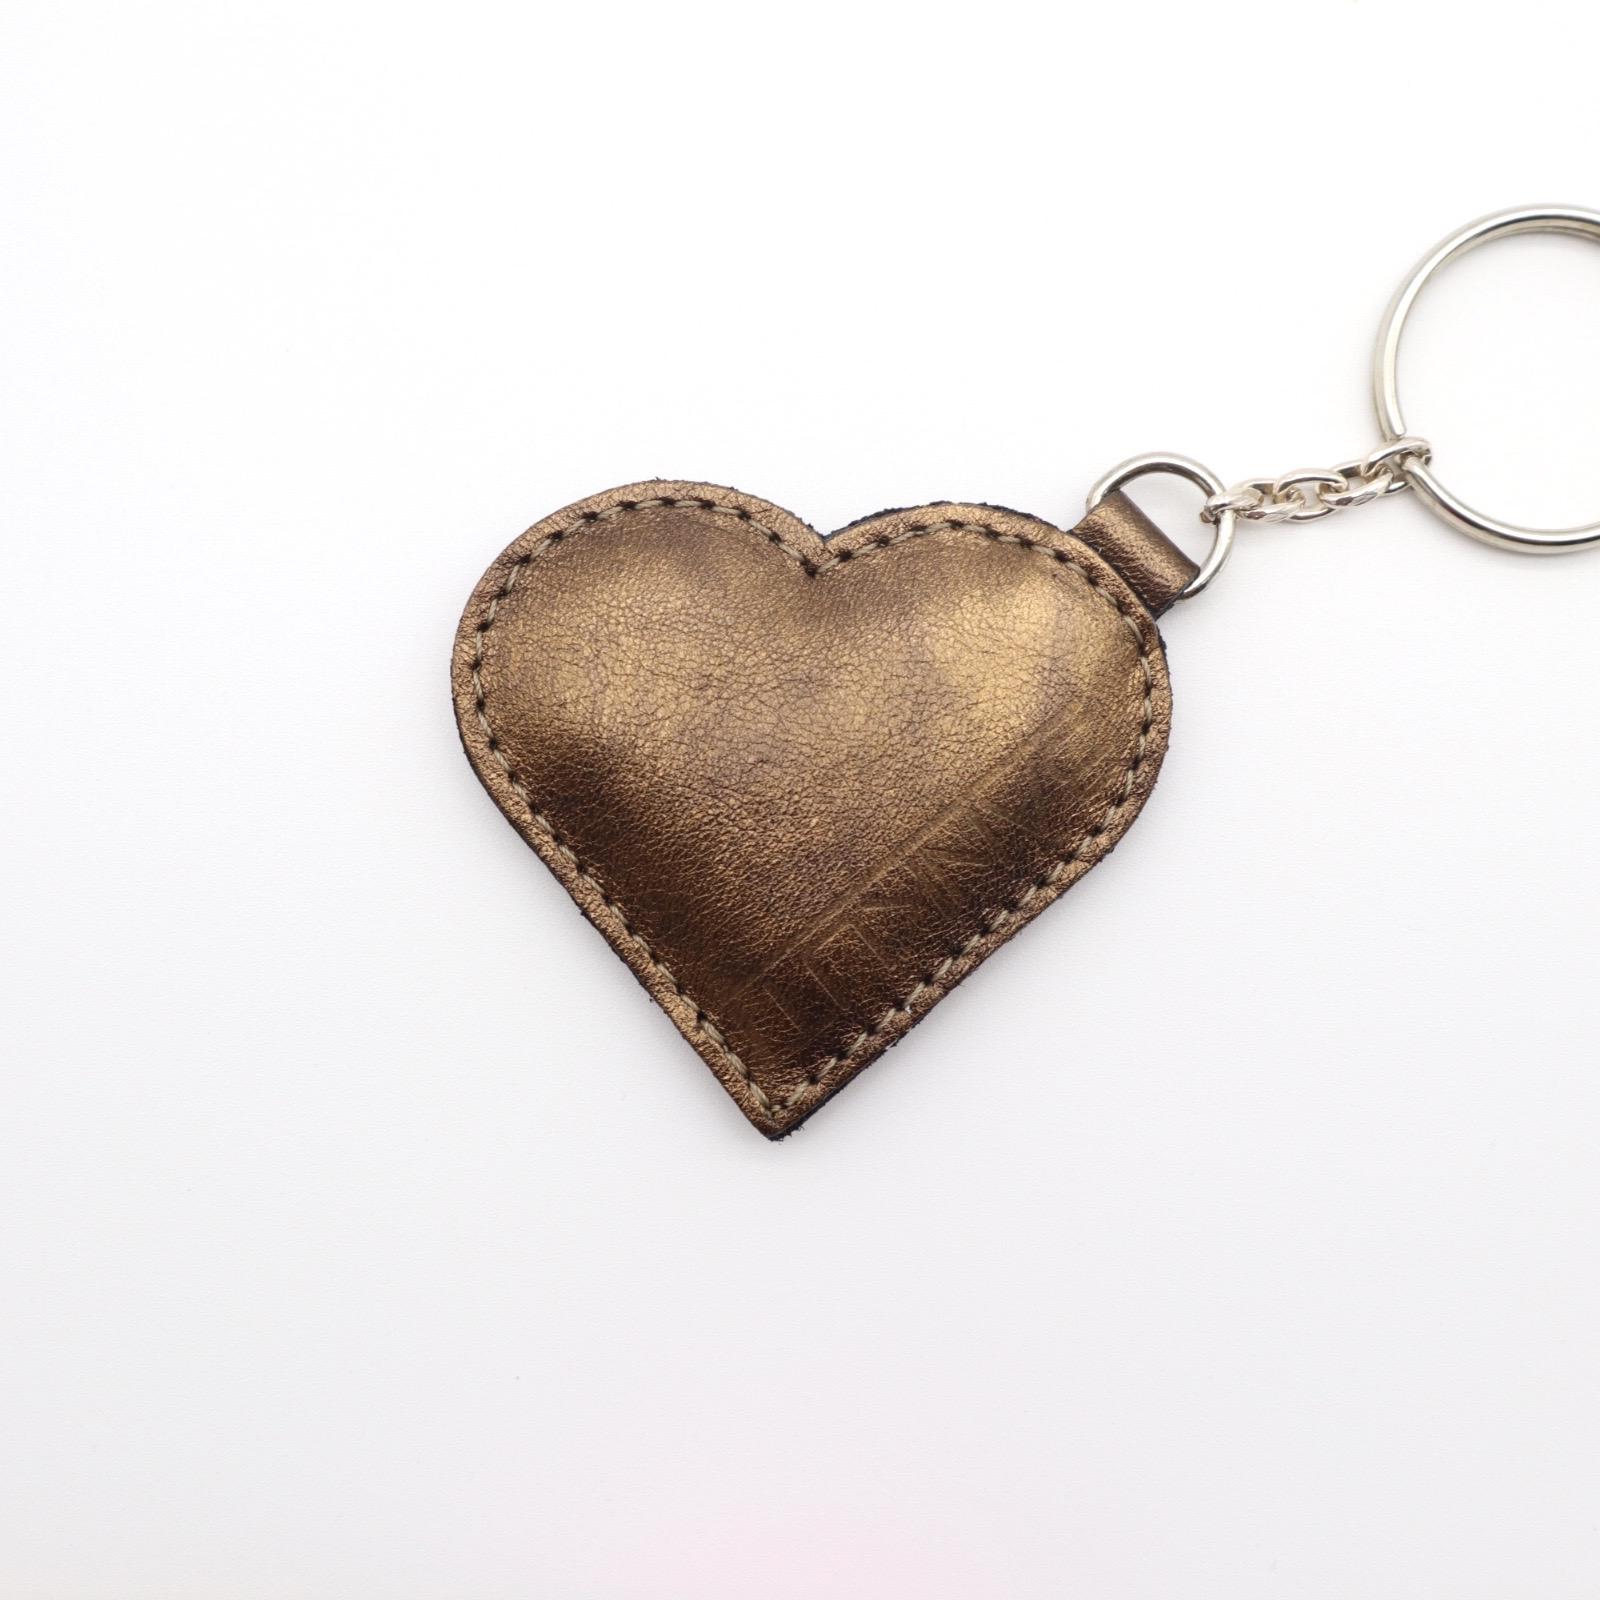 LEATHER HEART KEYCHARM BRONZE